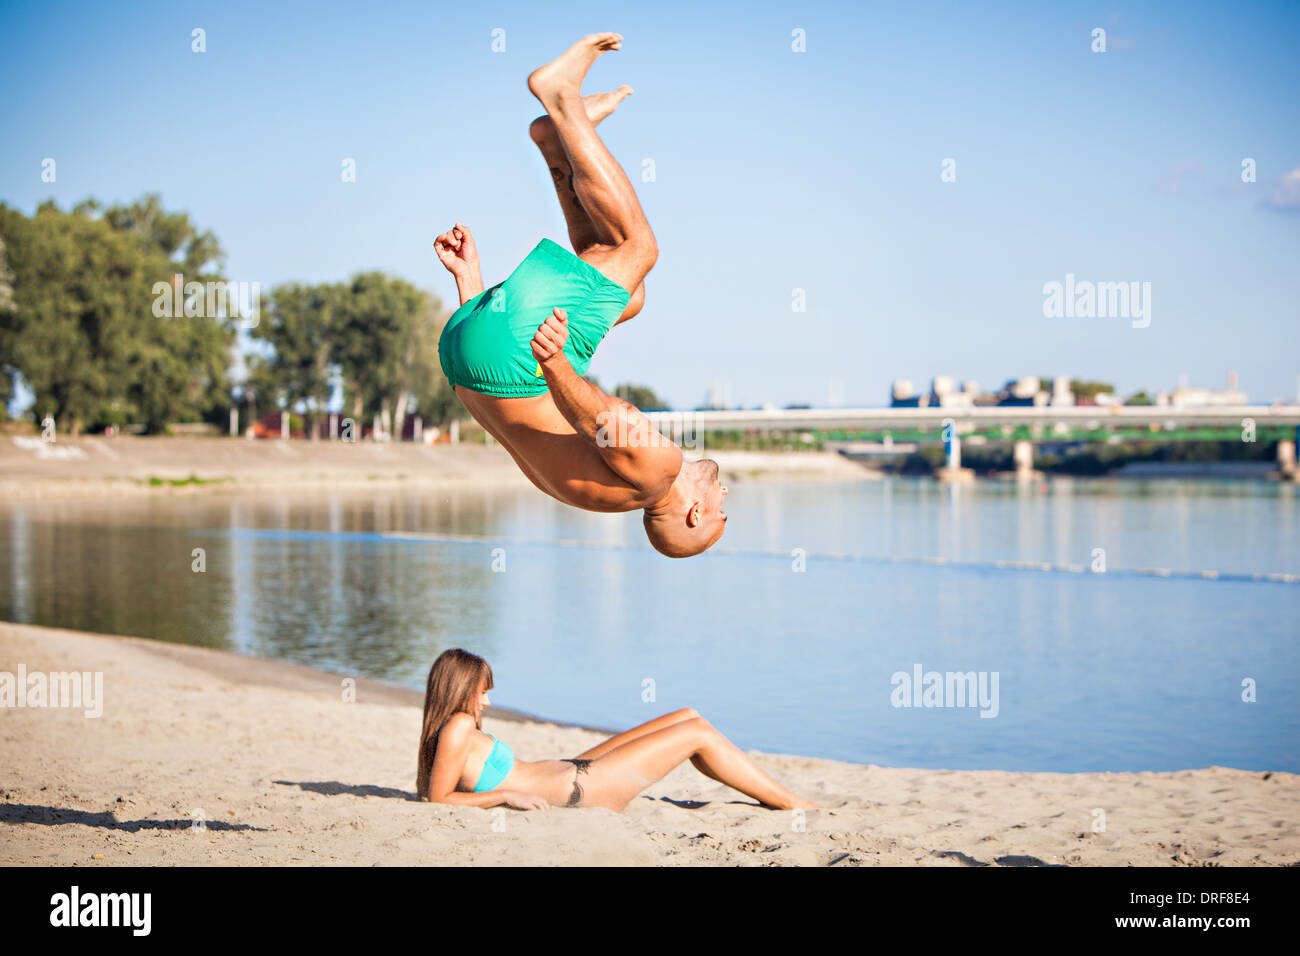 Young man somersaulting on the beach, Drava river, Osijek, Croatia - Stock Image